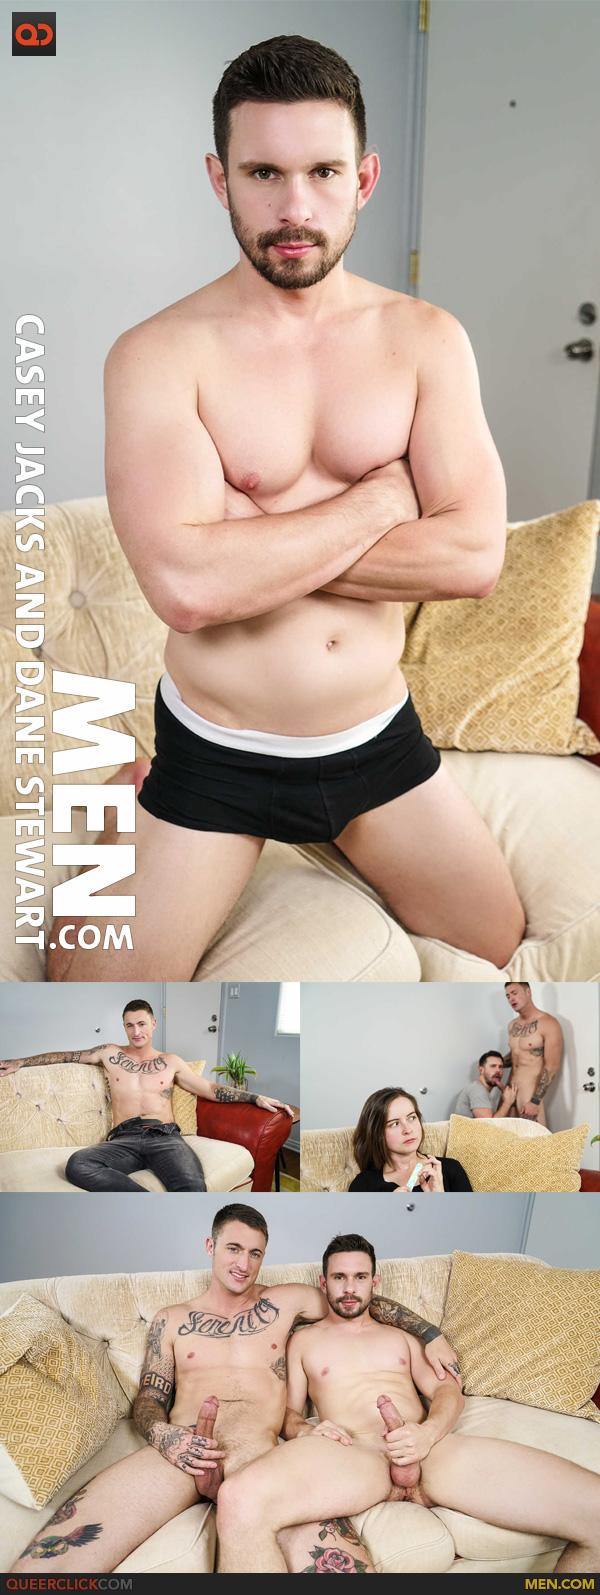 Men.com:  Casey Jacks and Dane Stewart